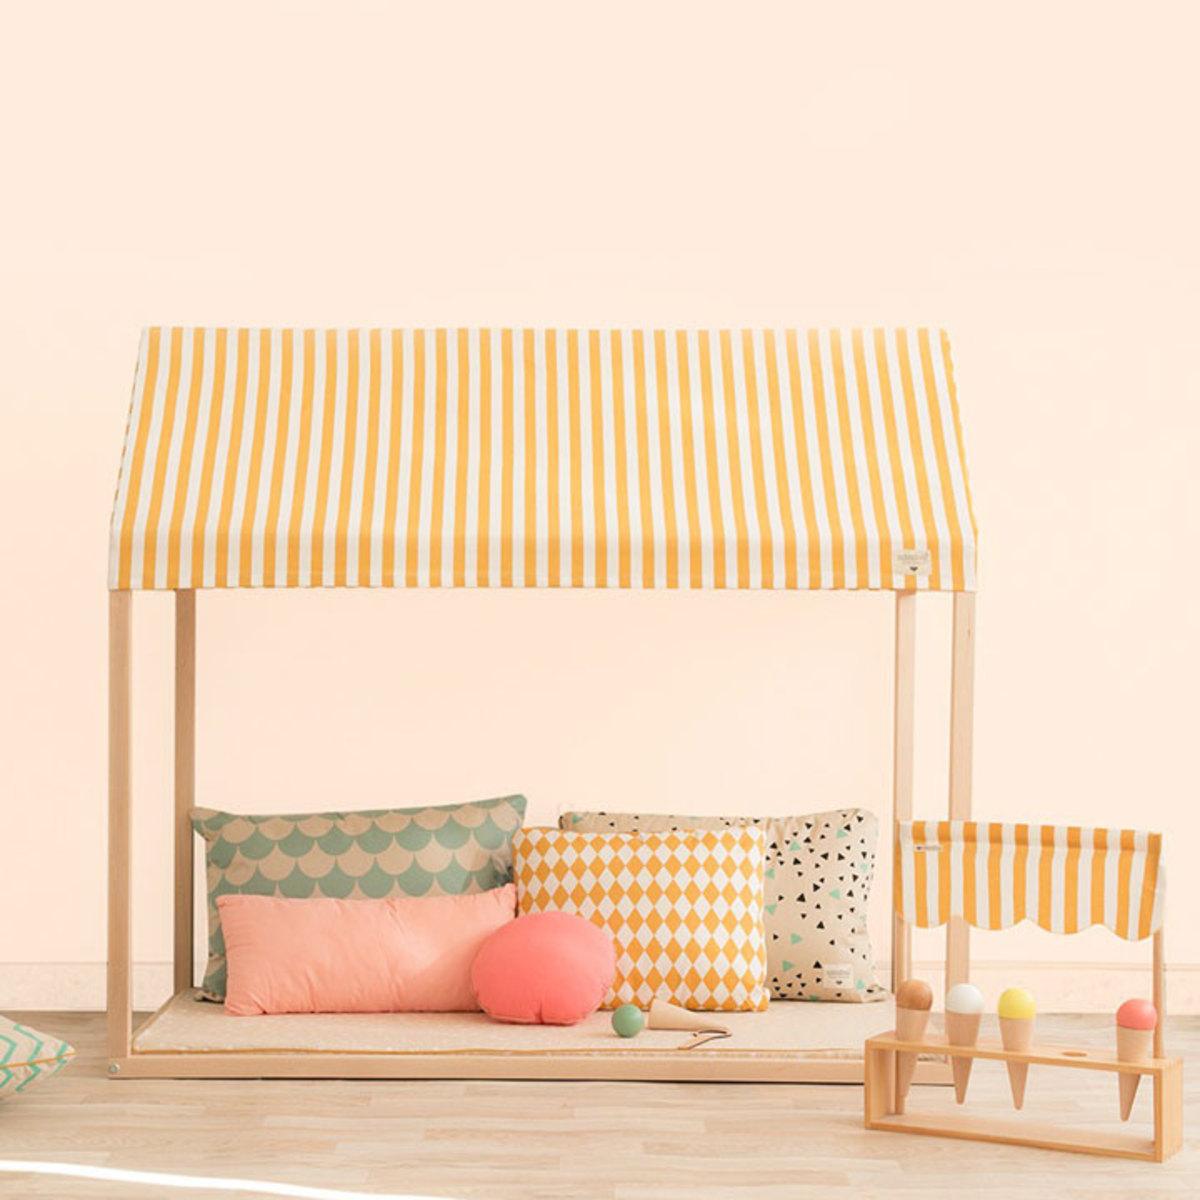 nobodinoz lit maison ibiza losanges miel lit b b. Black Bedroom Furniture Sets. Home Design Ideas